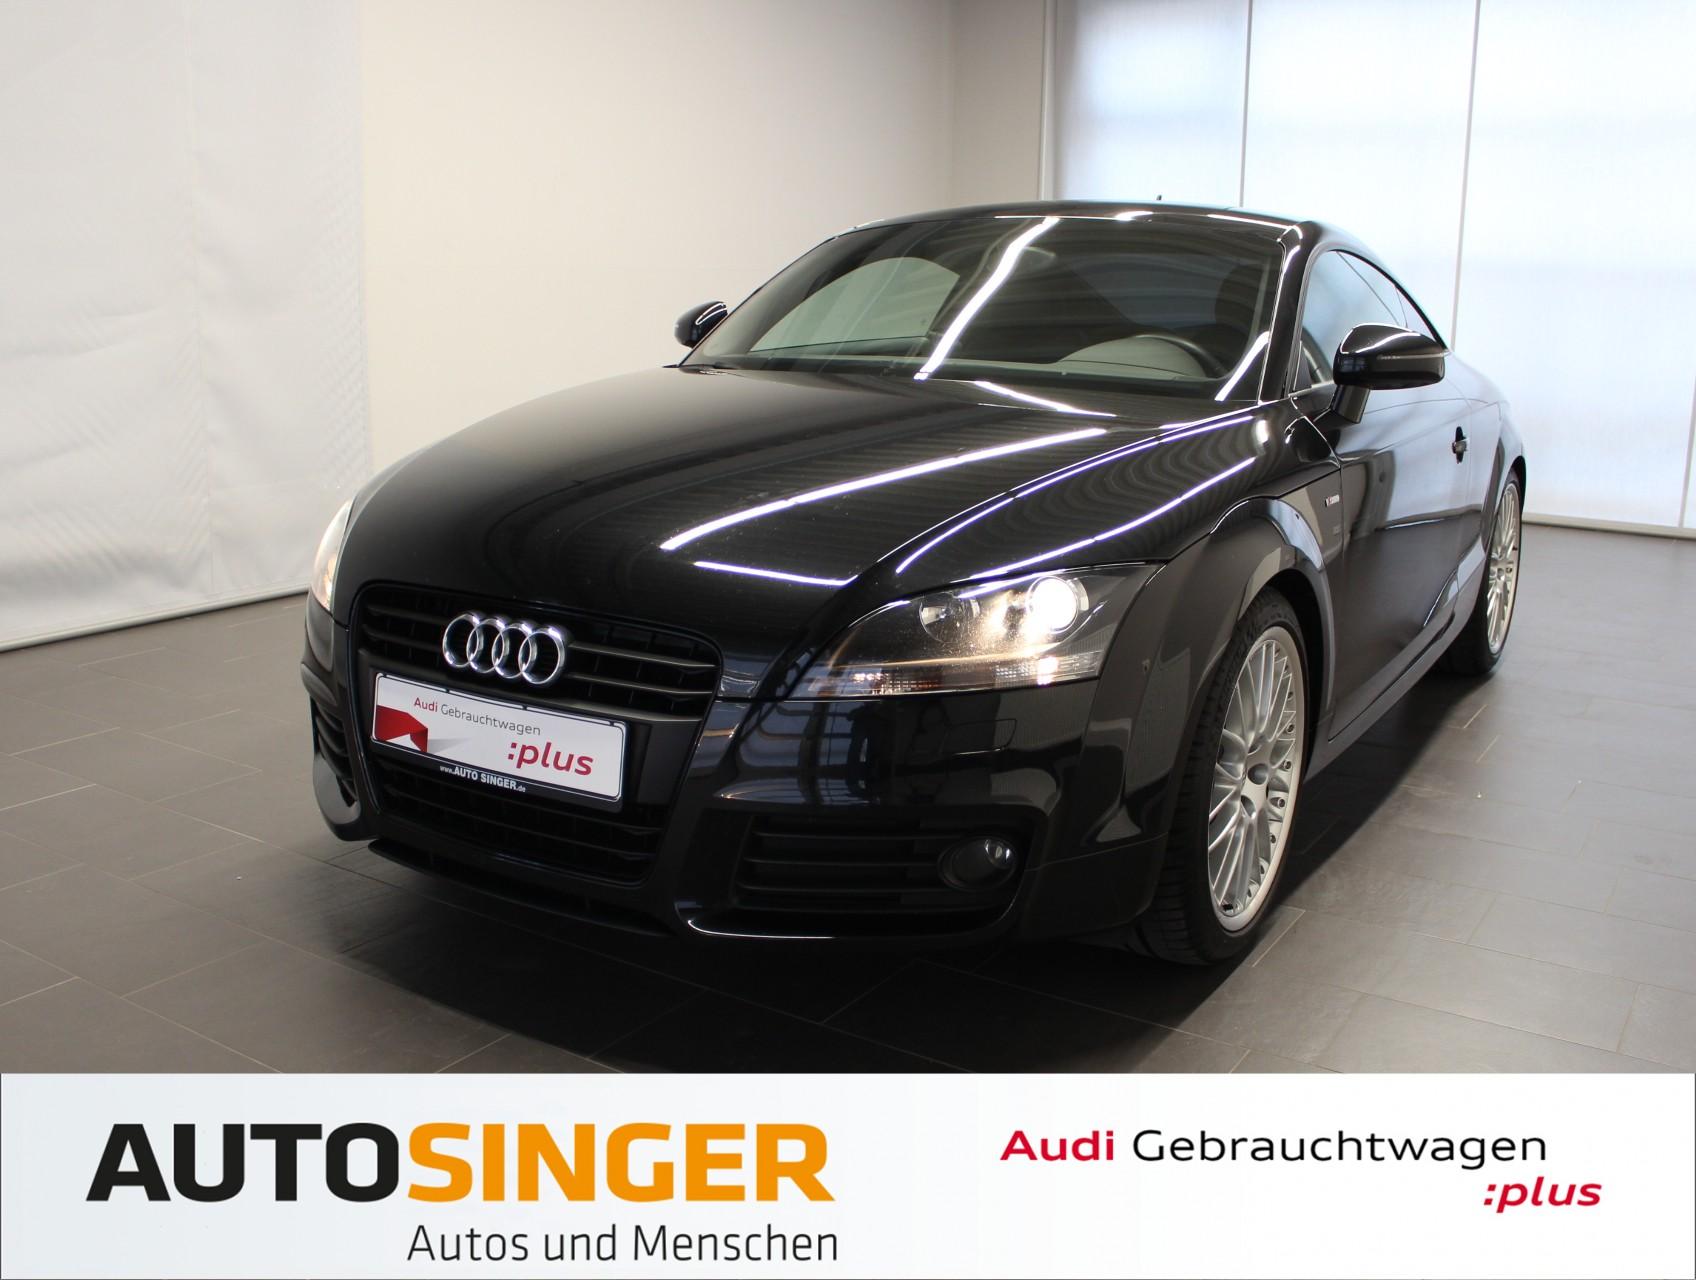 Audi TT Coupé 1,8 TFSI S tronic S line *Navi*SHZ*Alu19'*, Jahr 2013, petrol